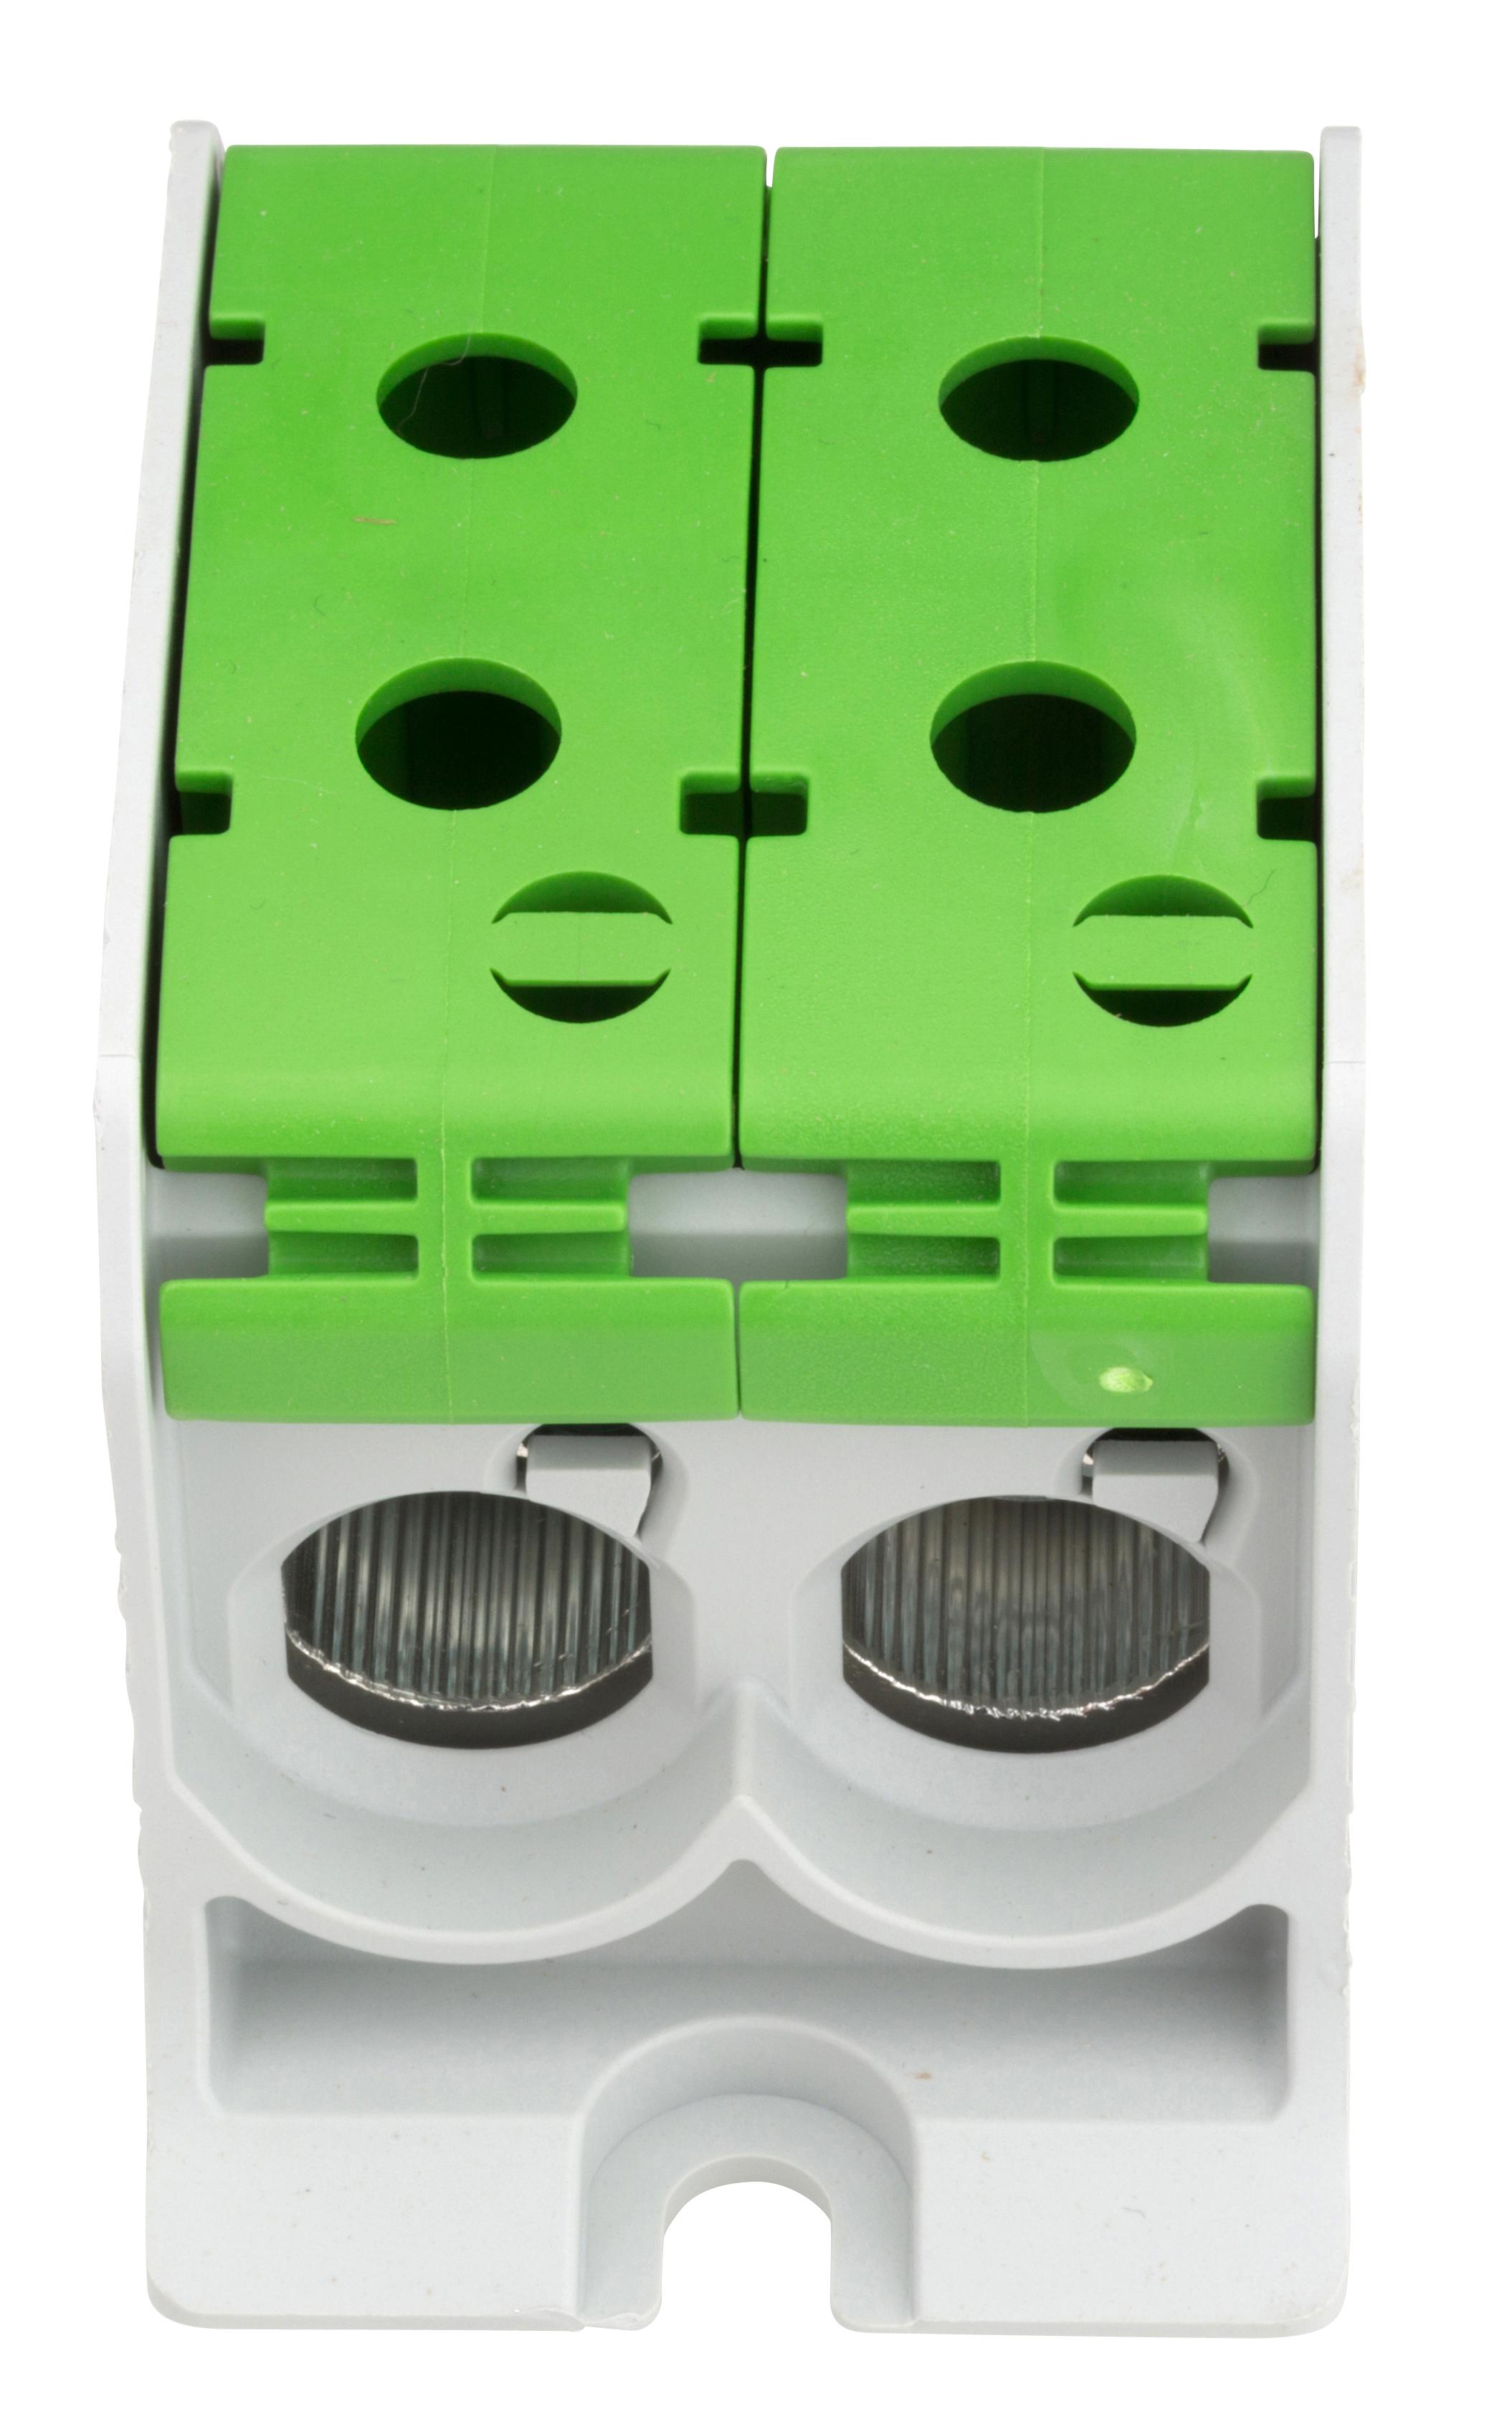 1 Stk Aluminium /Kupfer Klemme, 1-polig, Doppel 95mm² grün IKA21436--